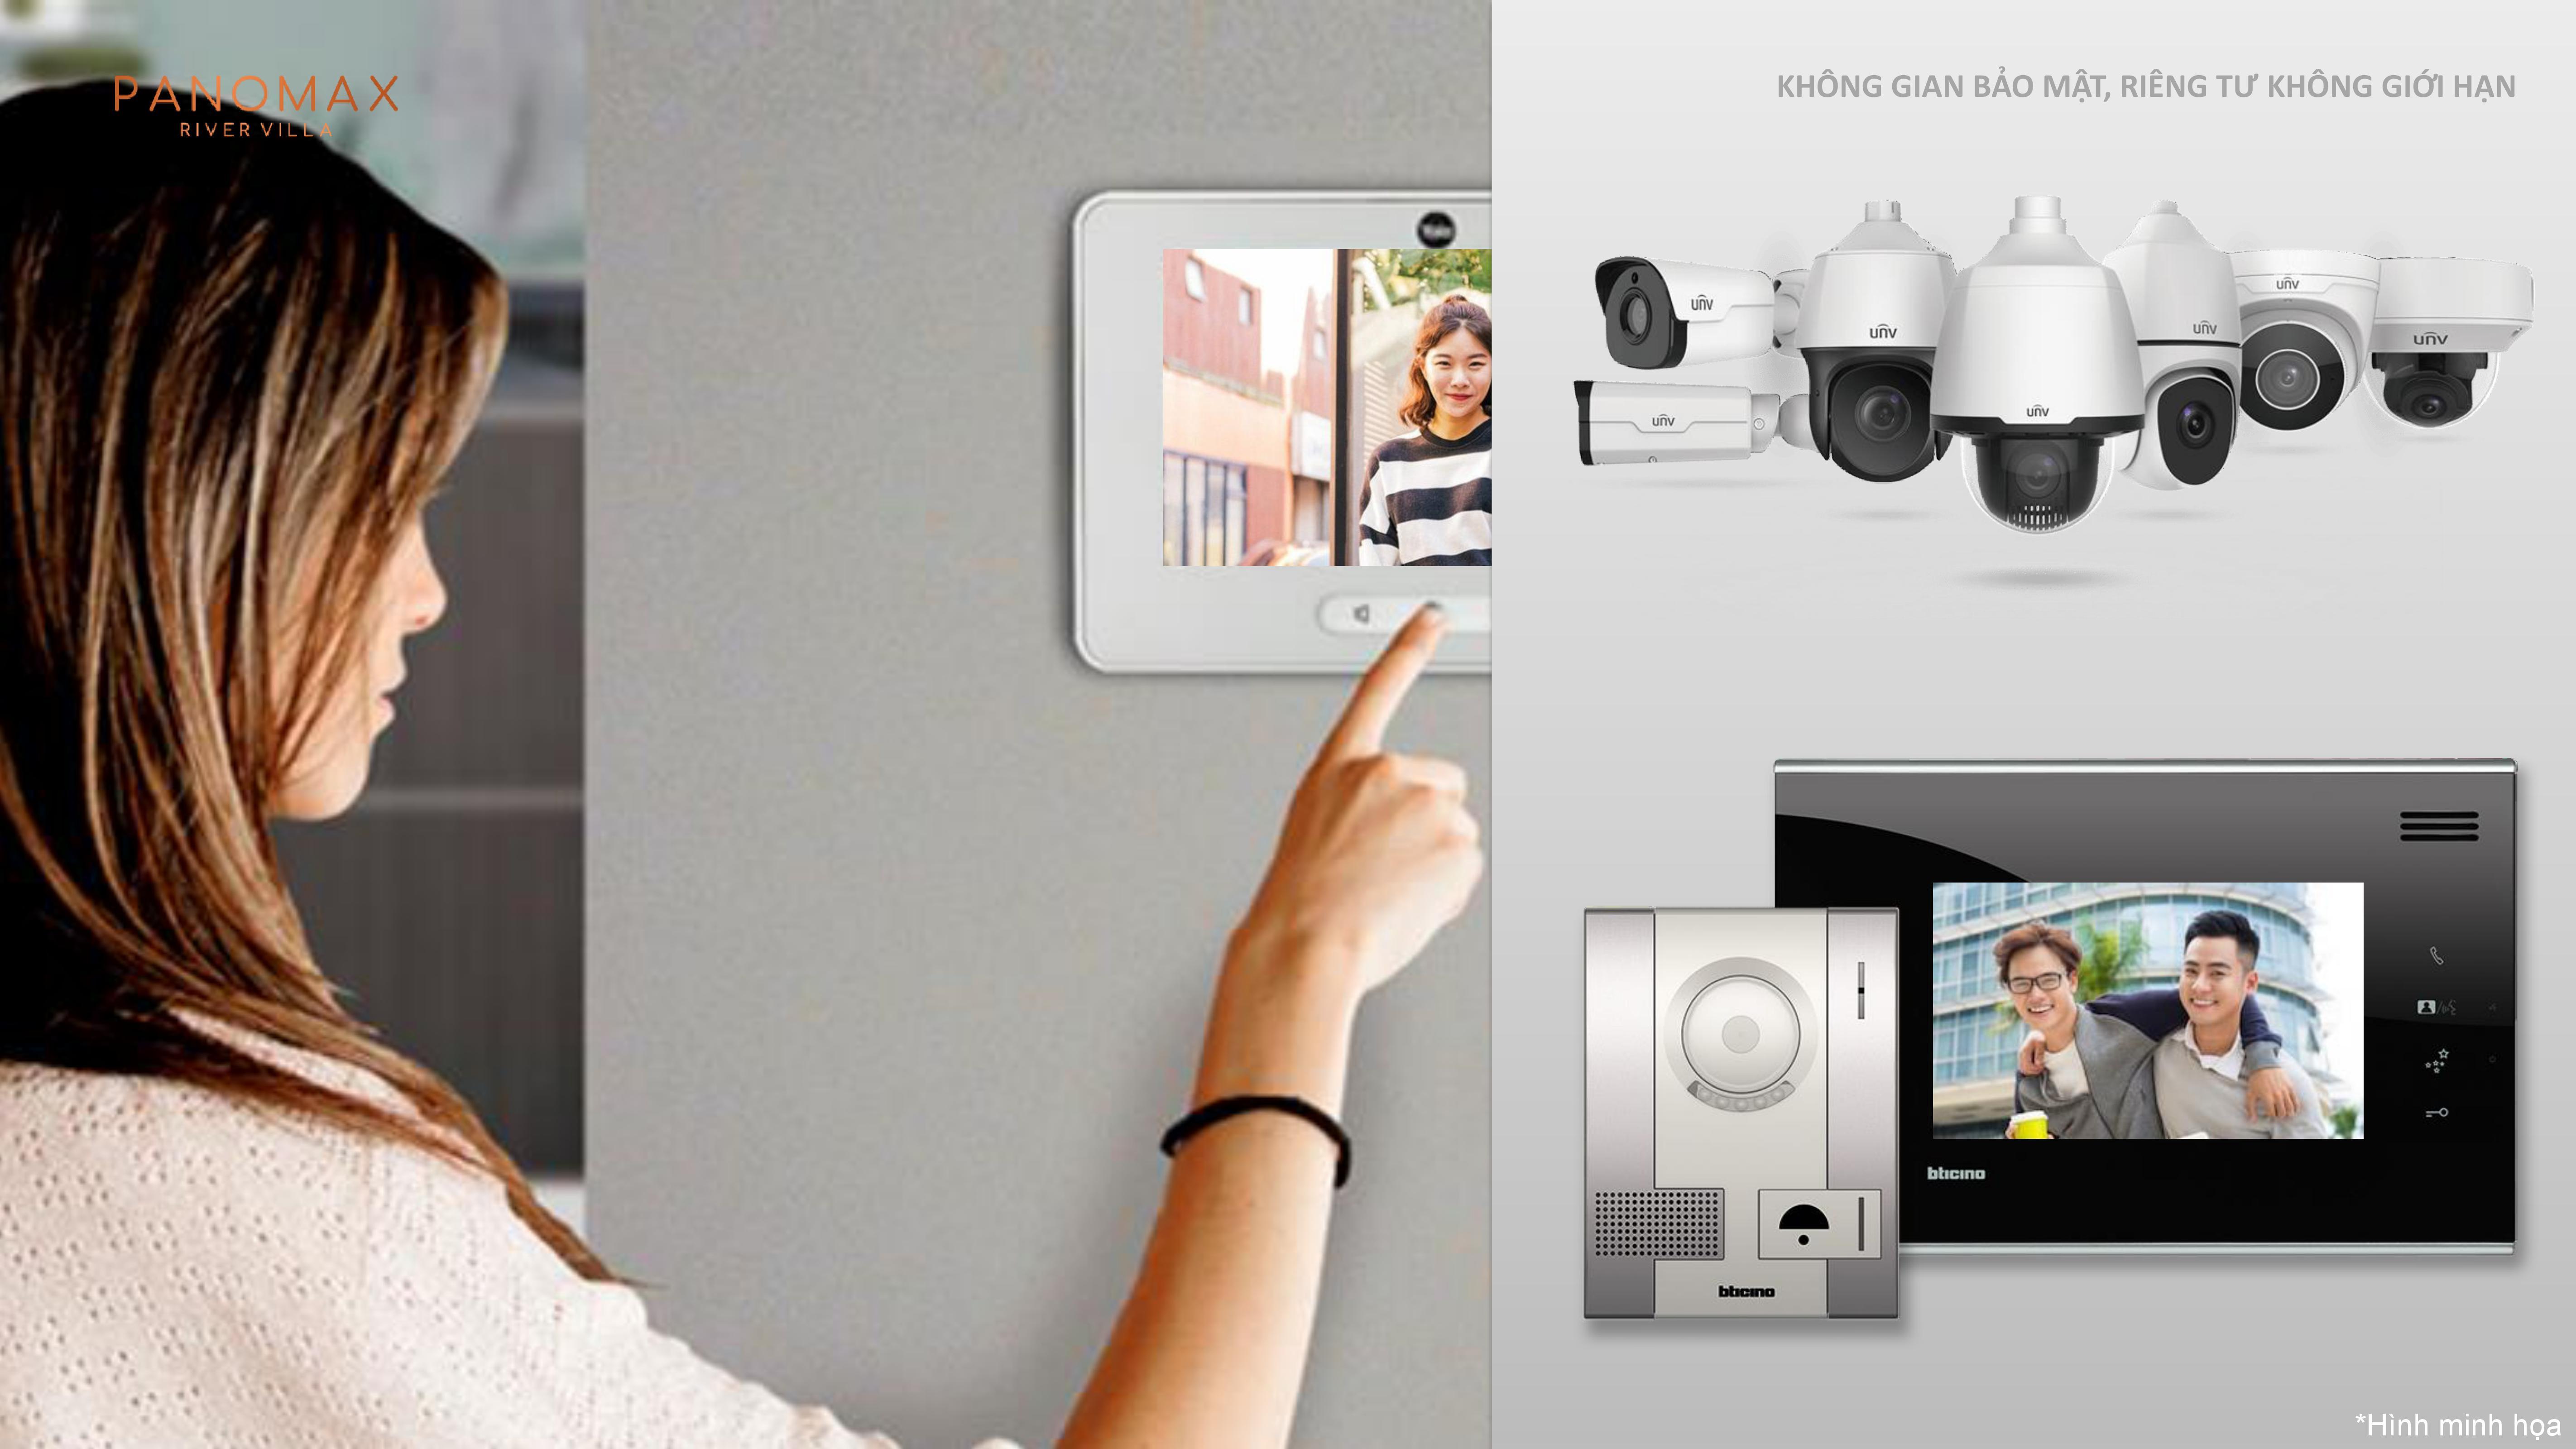 Video Doorphone tại dự án Panomax River Villa Quận 7